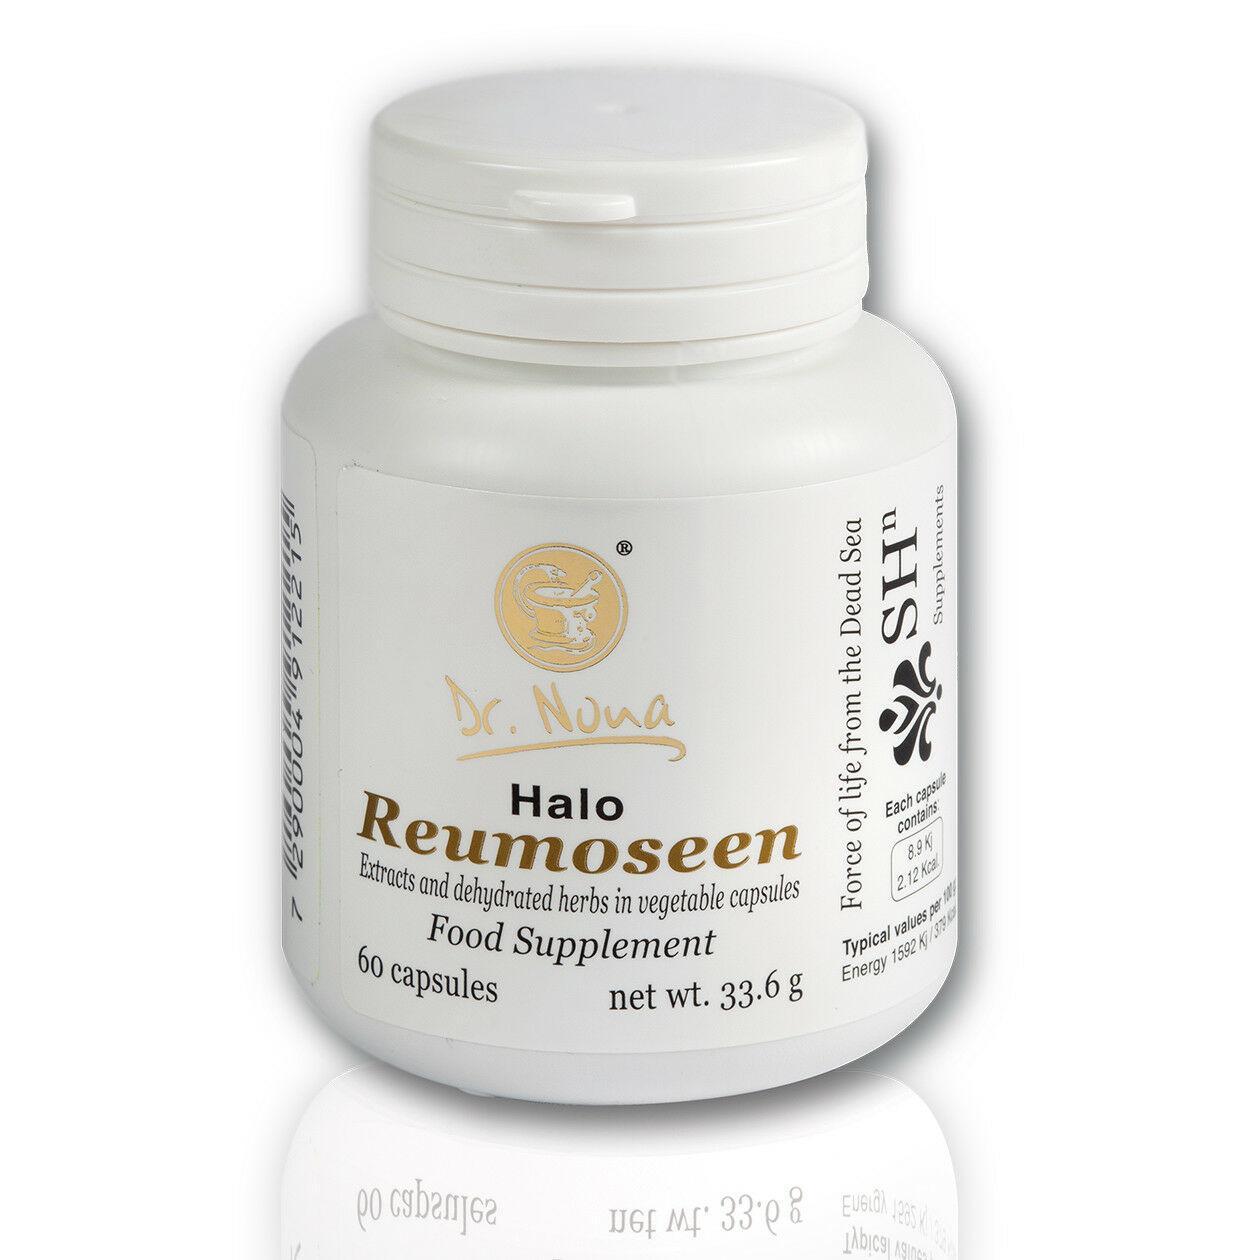 Доктор Нона Ревмосин Доктор Нона / Dr.Nona - Halo Reumoseen - Dead Sea Minerals Dietary Supplement Vitamins